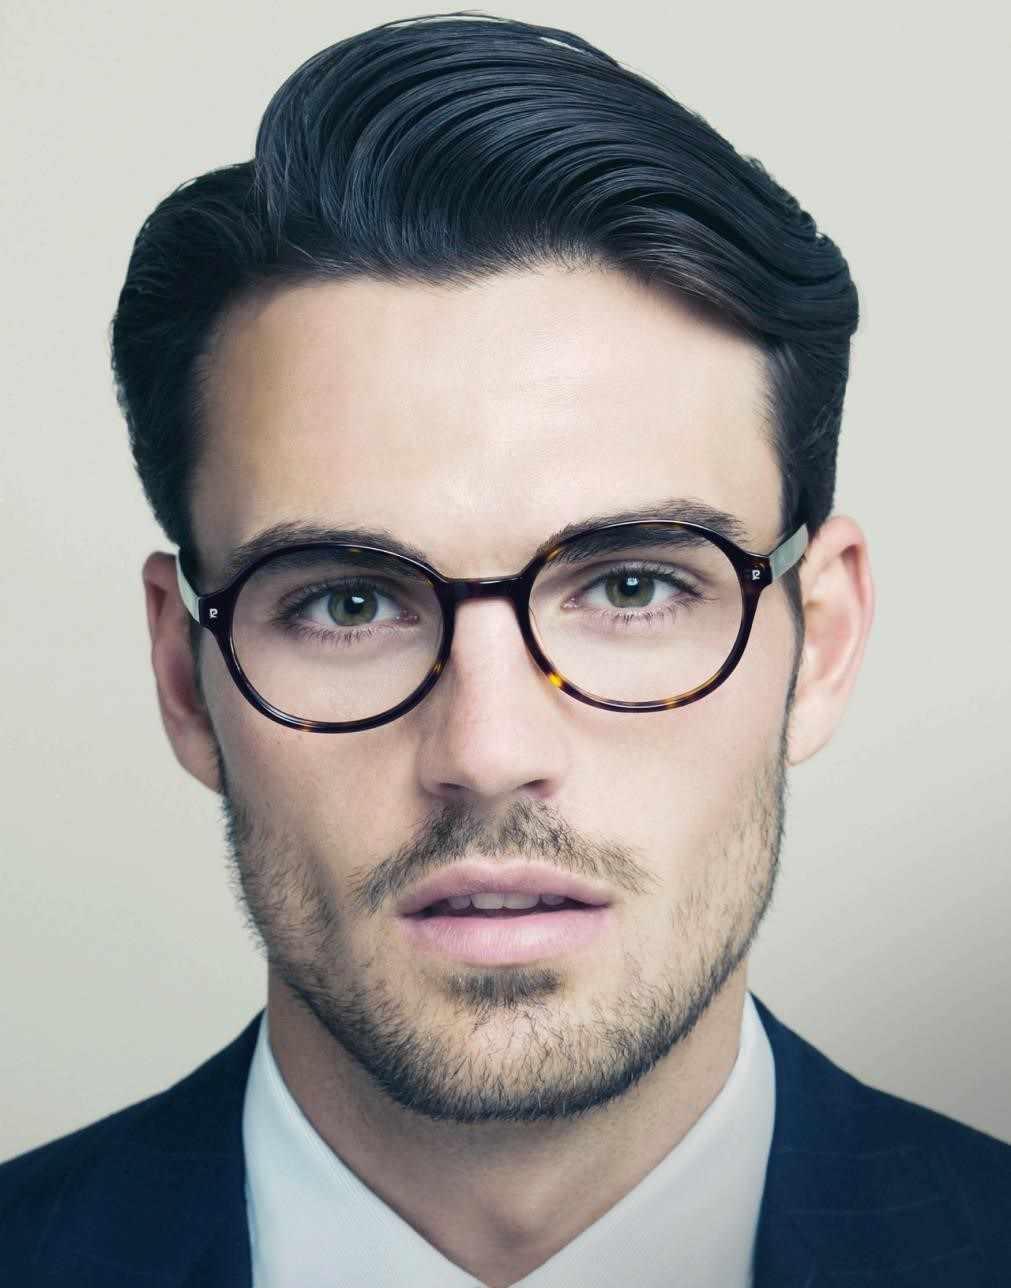 2014 Summer haircuts for men top trends from milan usa u uk pompadour google search fresh cutz pinterest pompadour Hairstyles Men